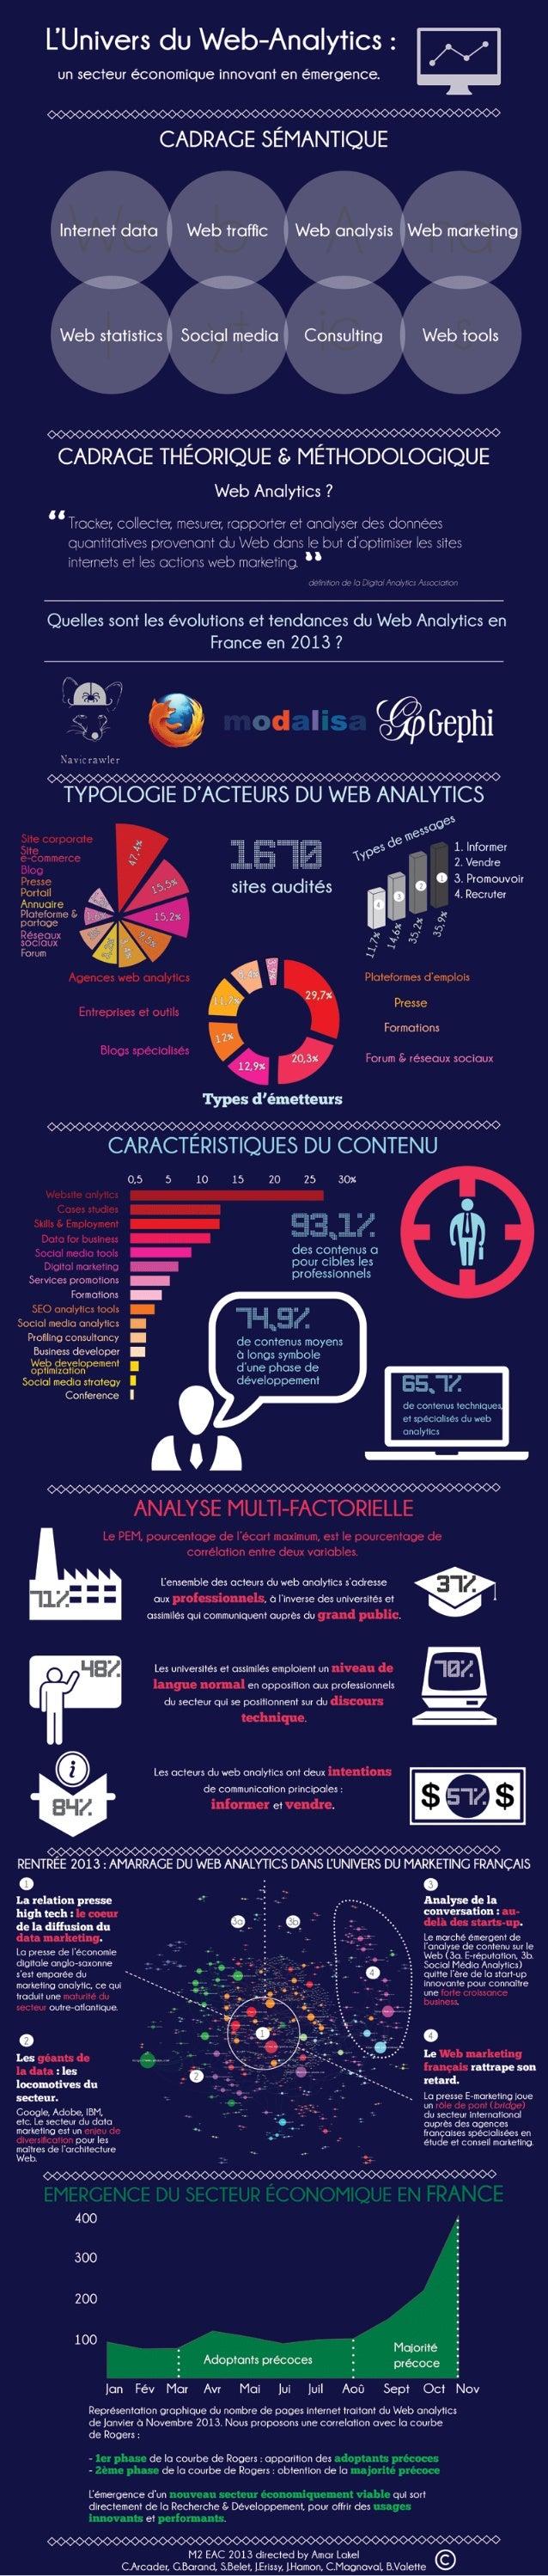 L'univers du Web Analytics